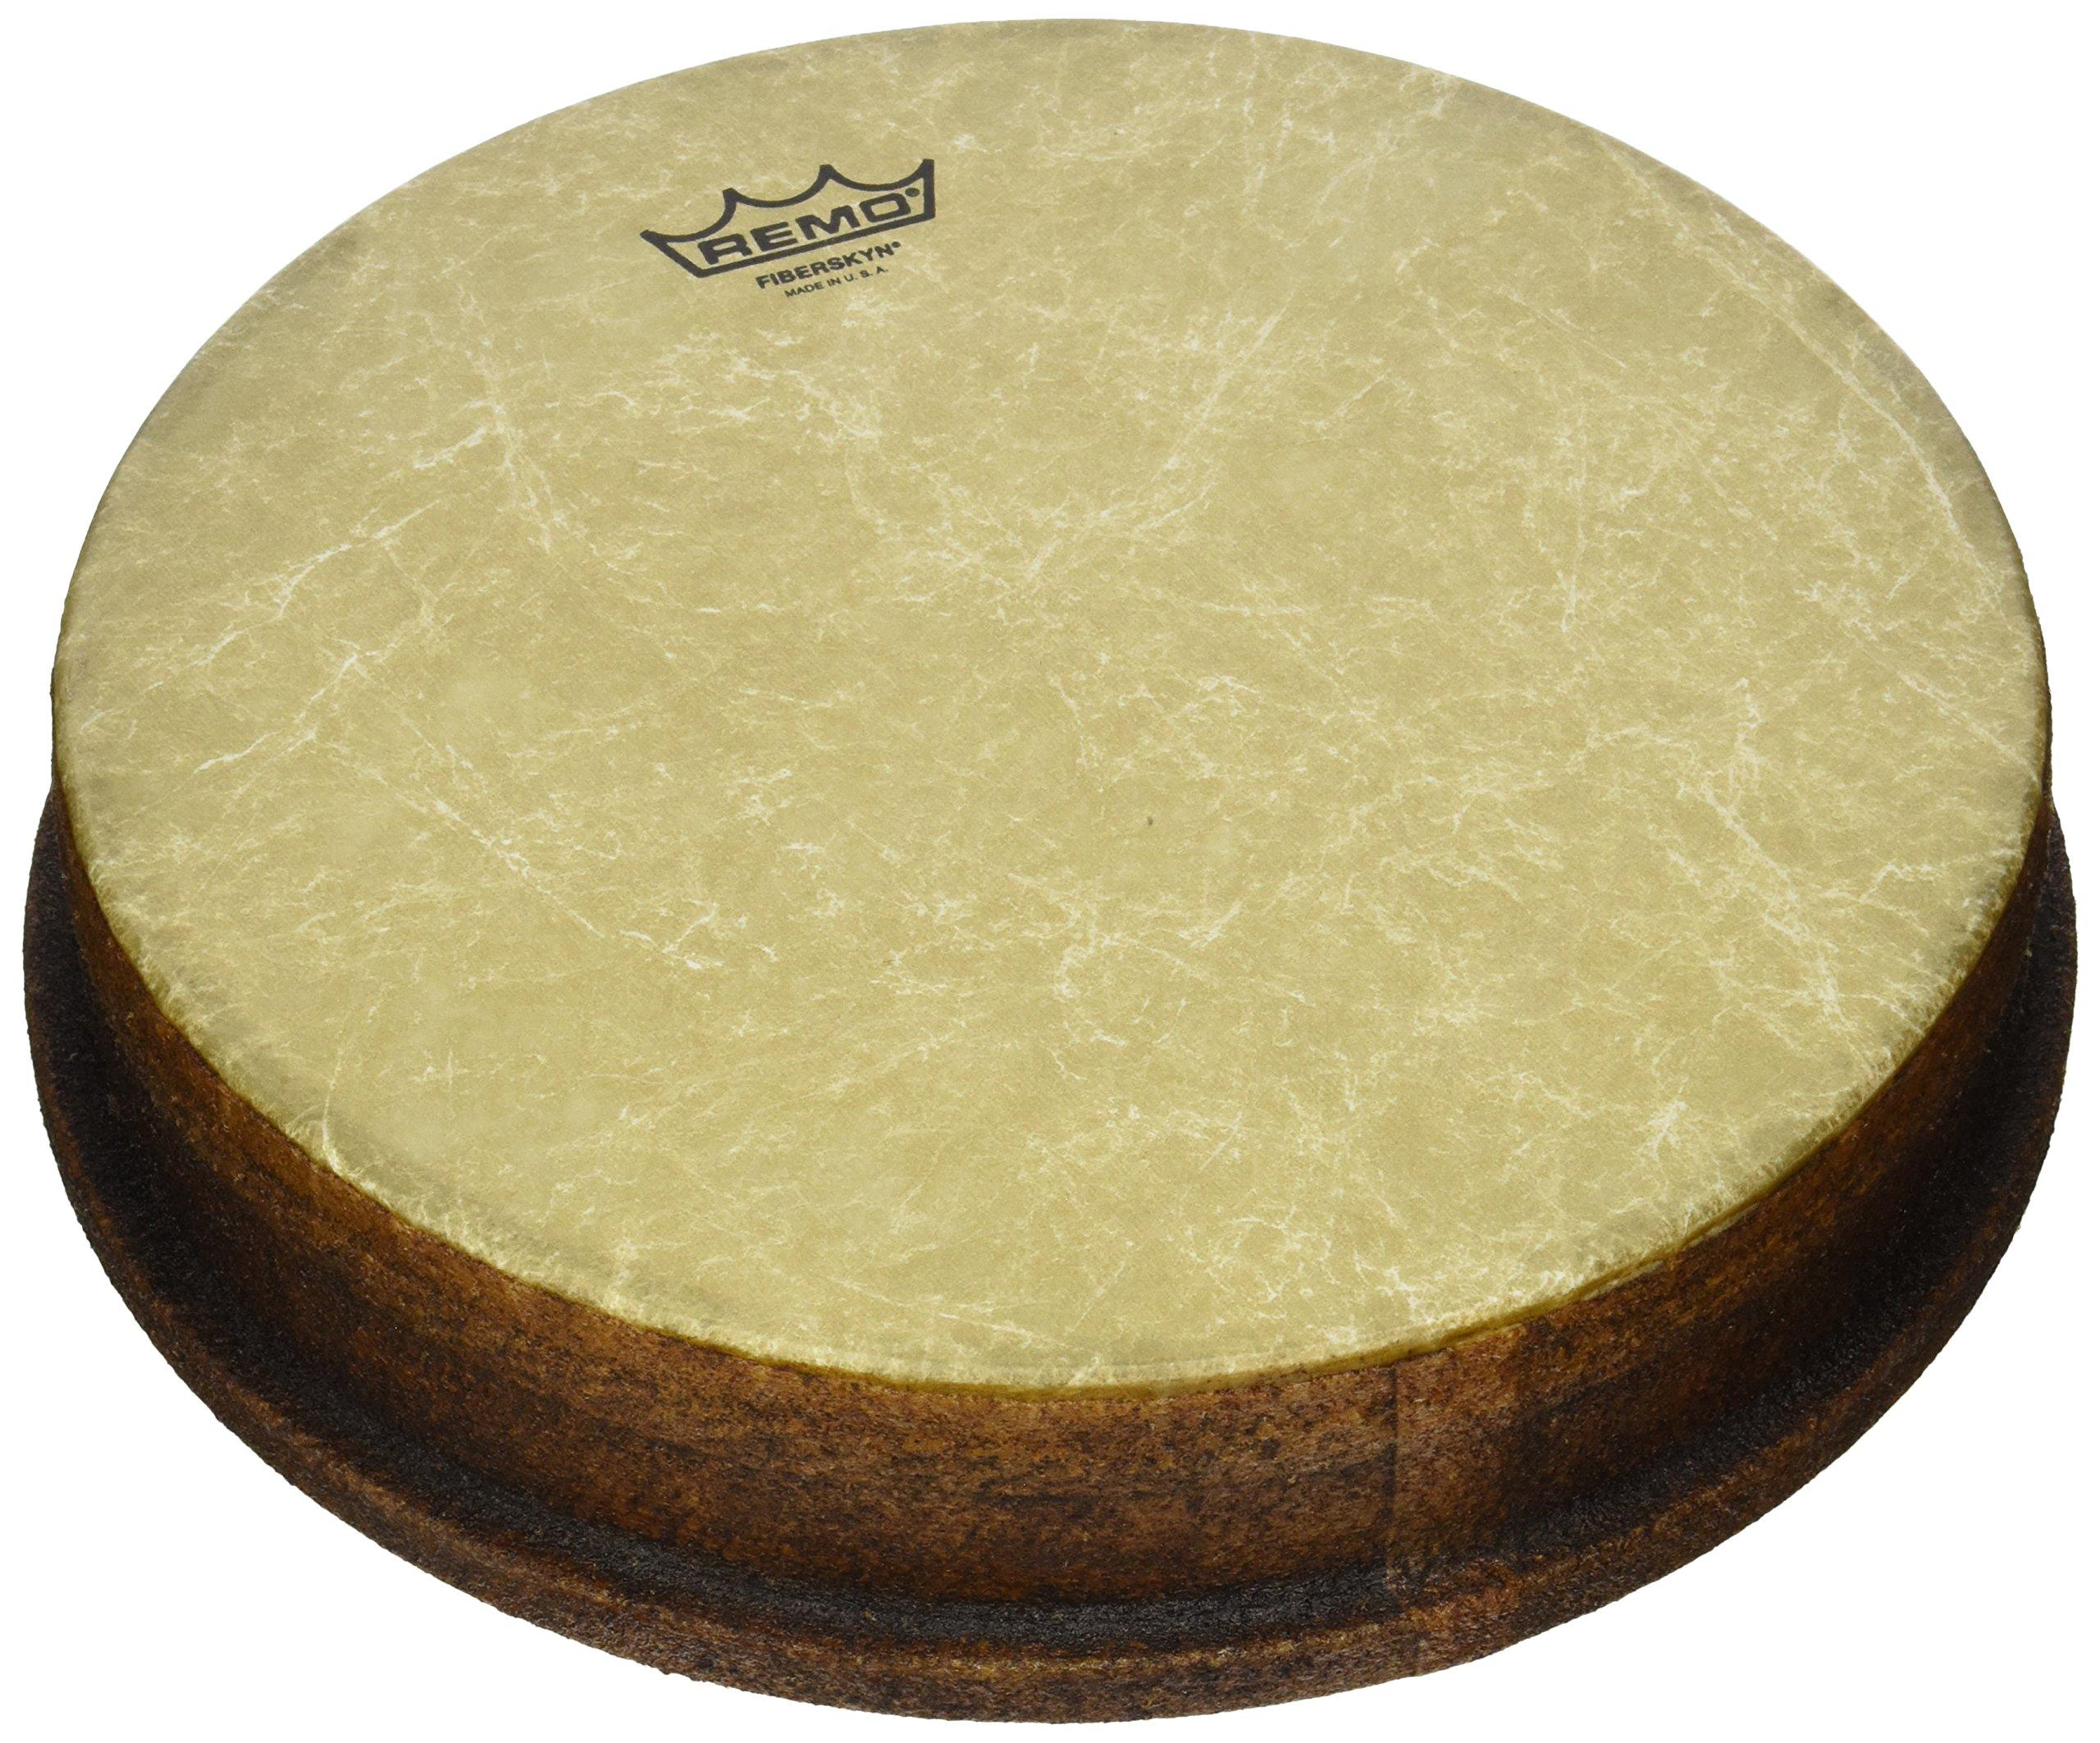 Remo Mondo Fiberskyn Djembe Drumhead, 12'' by Remo